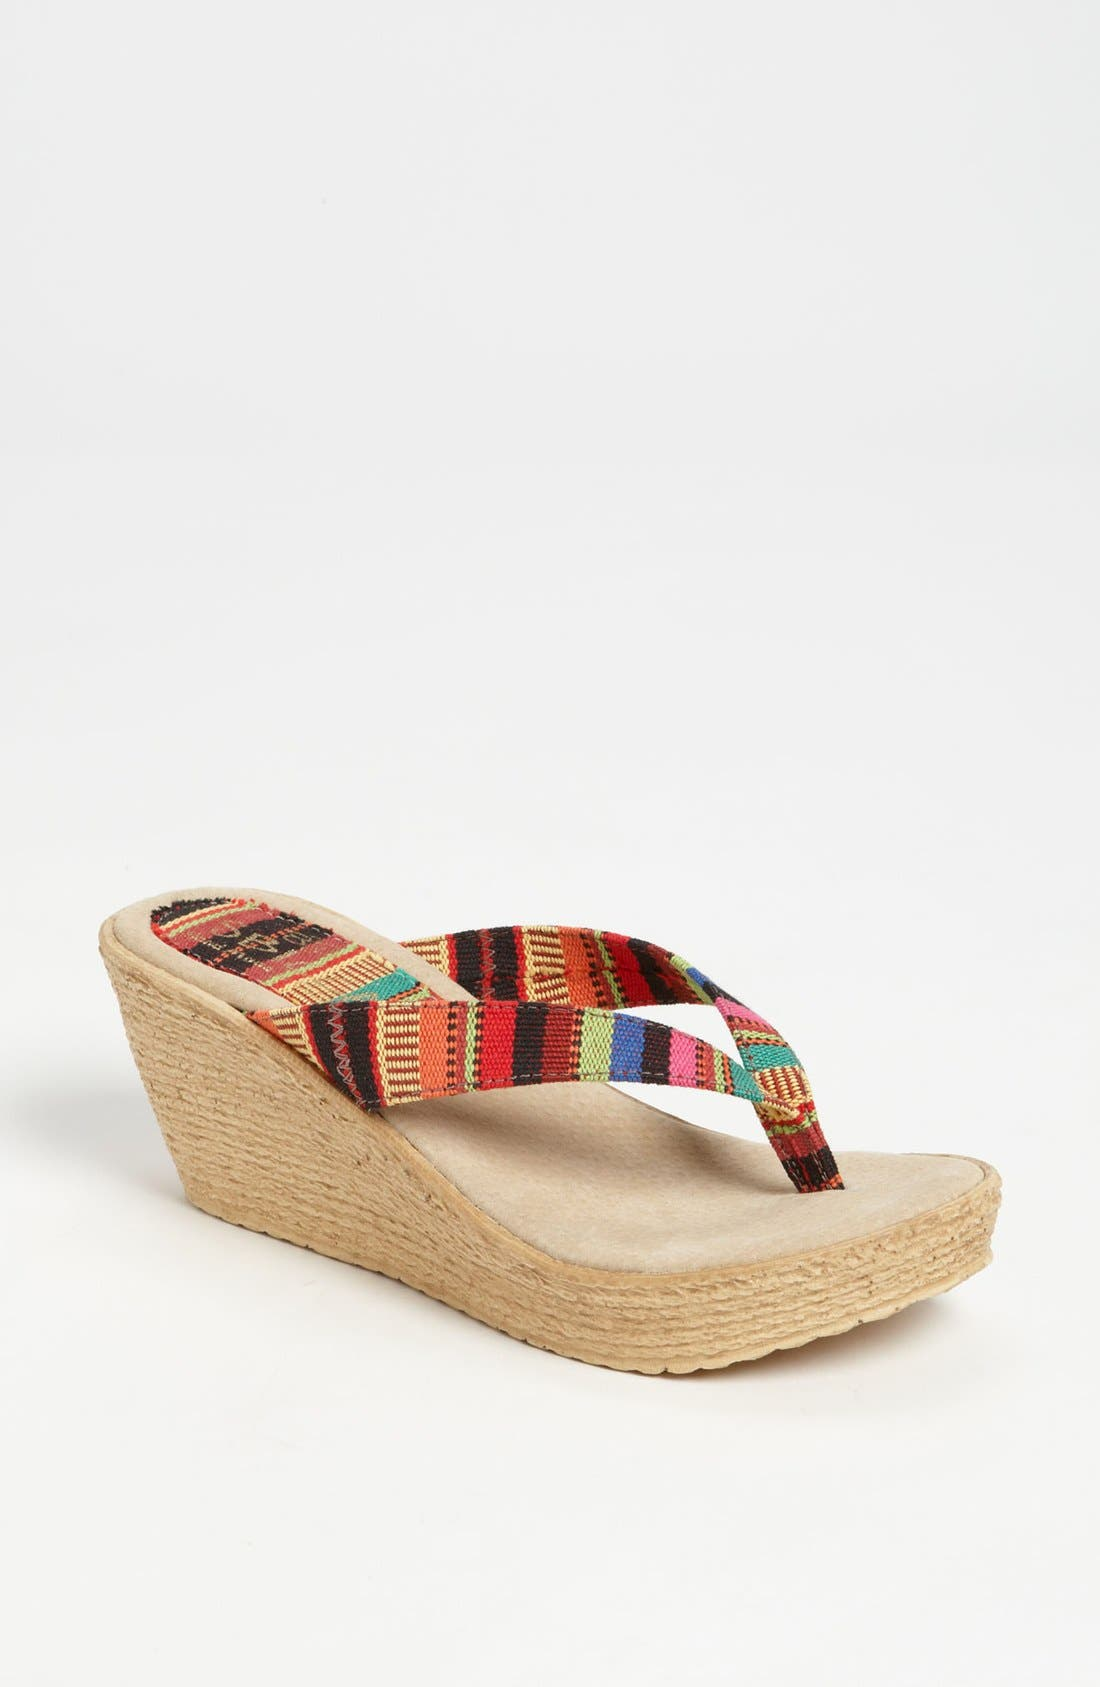 Main Image - Sbicca 'Andes' Wedge Sandal